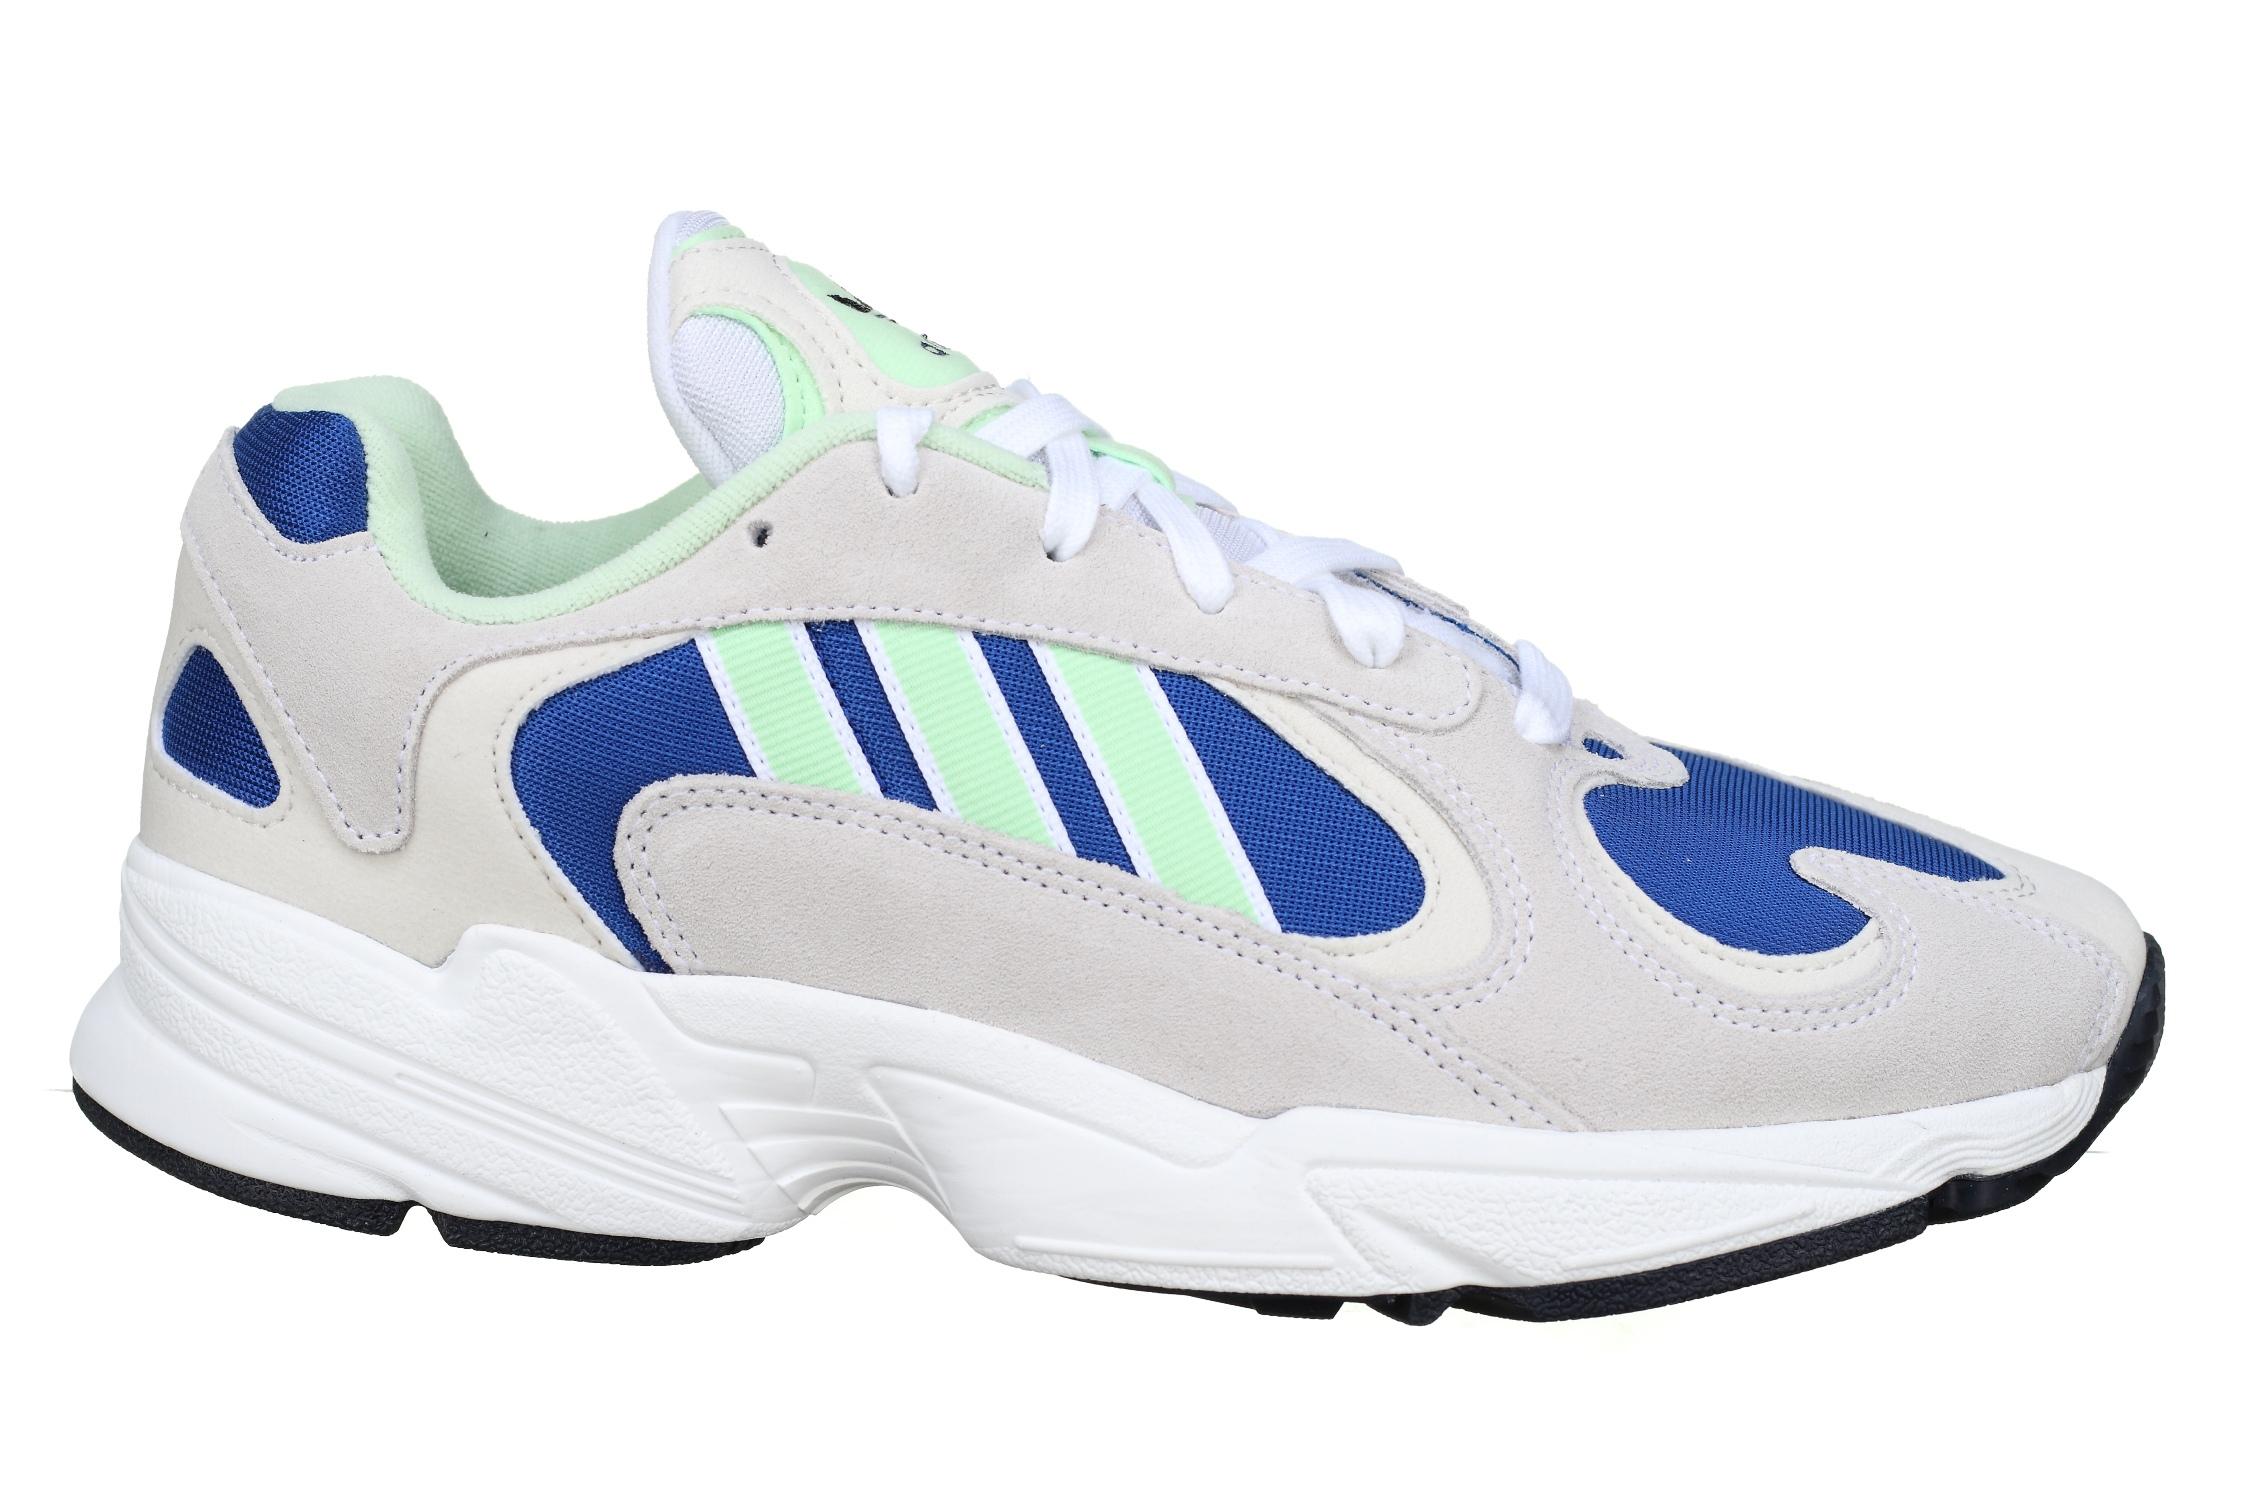 https://www.leadermode.com/179616/adidas-yung-1-ee5318-gris.jpg